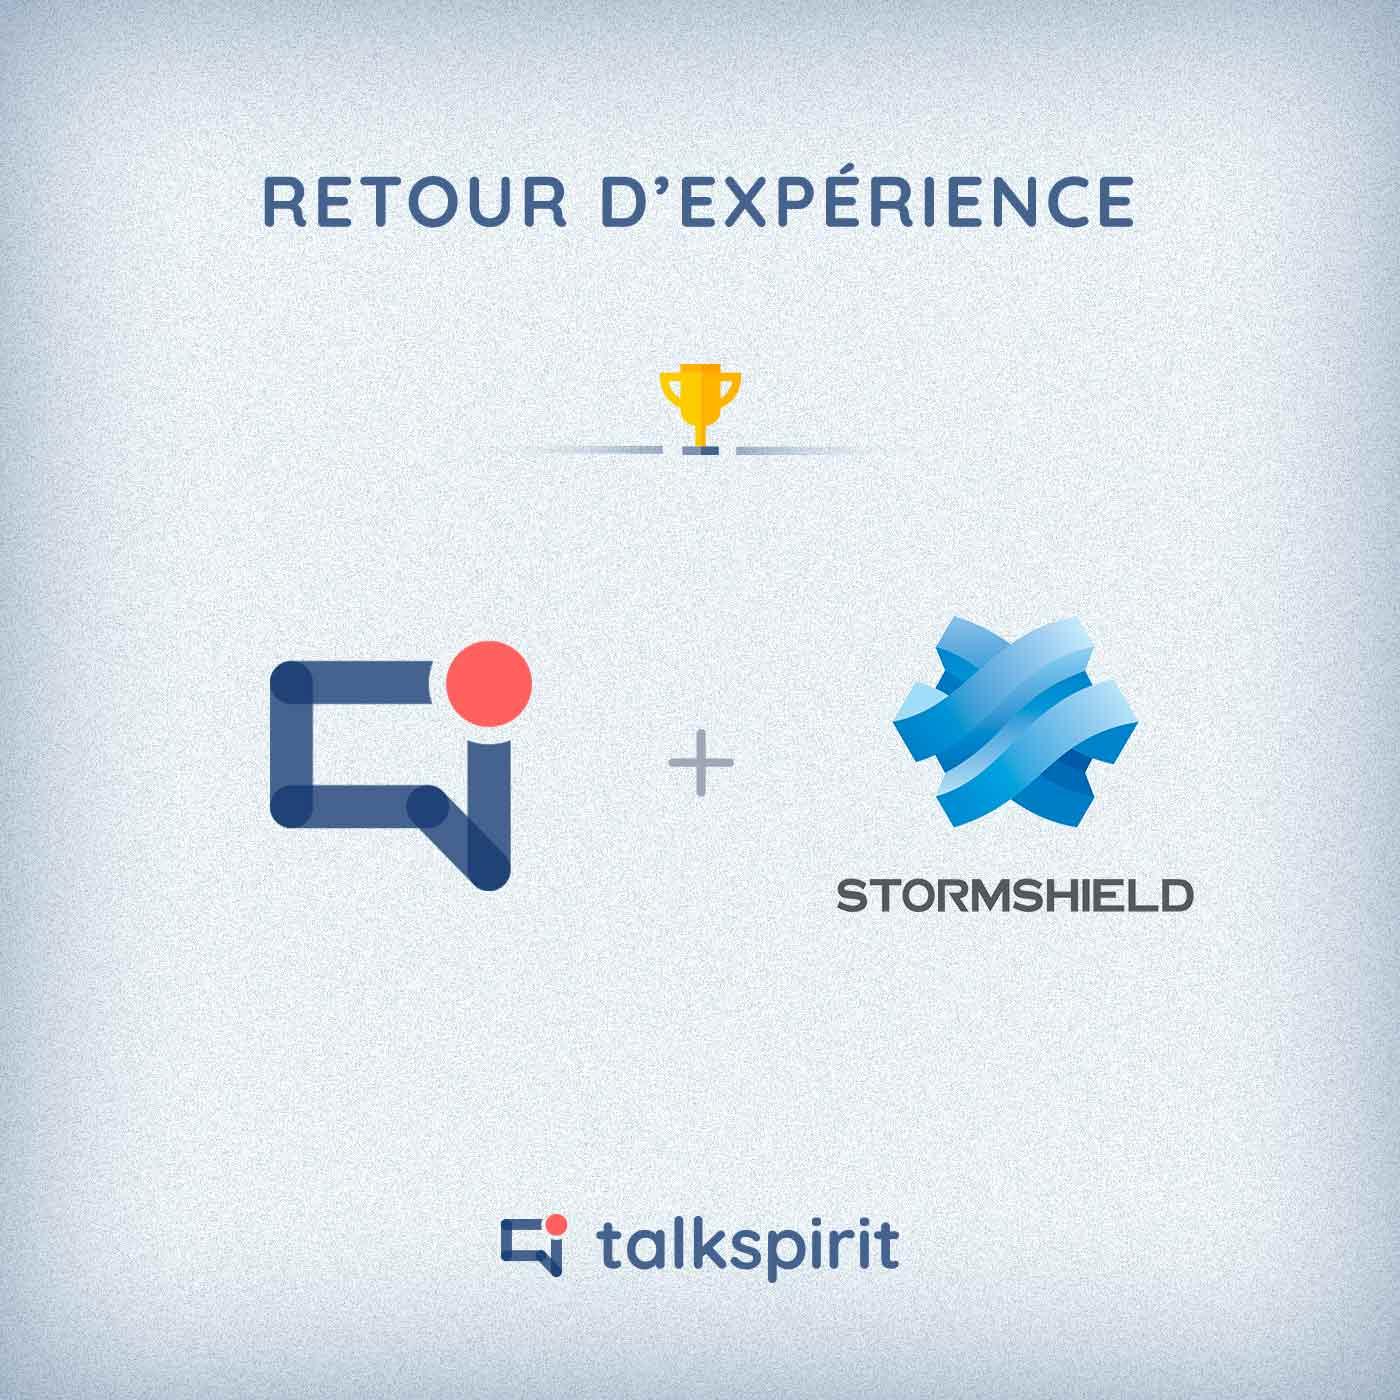 retour experience talkspirit stormshield